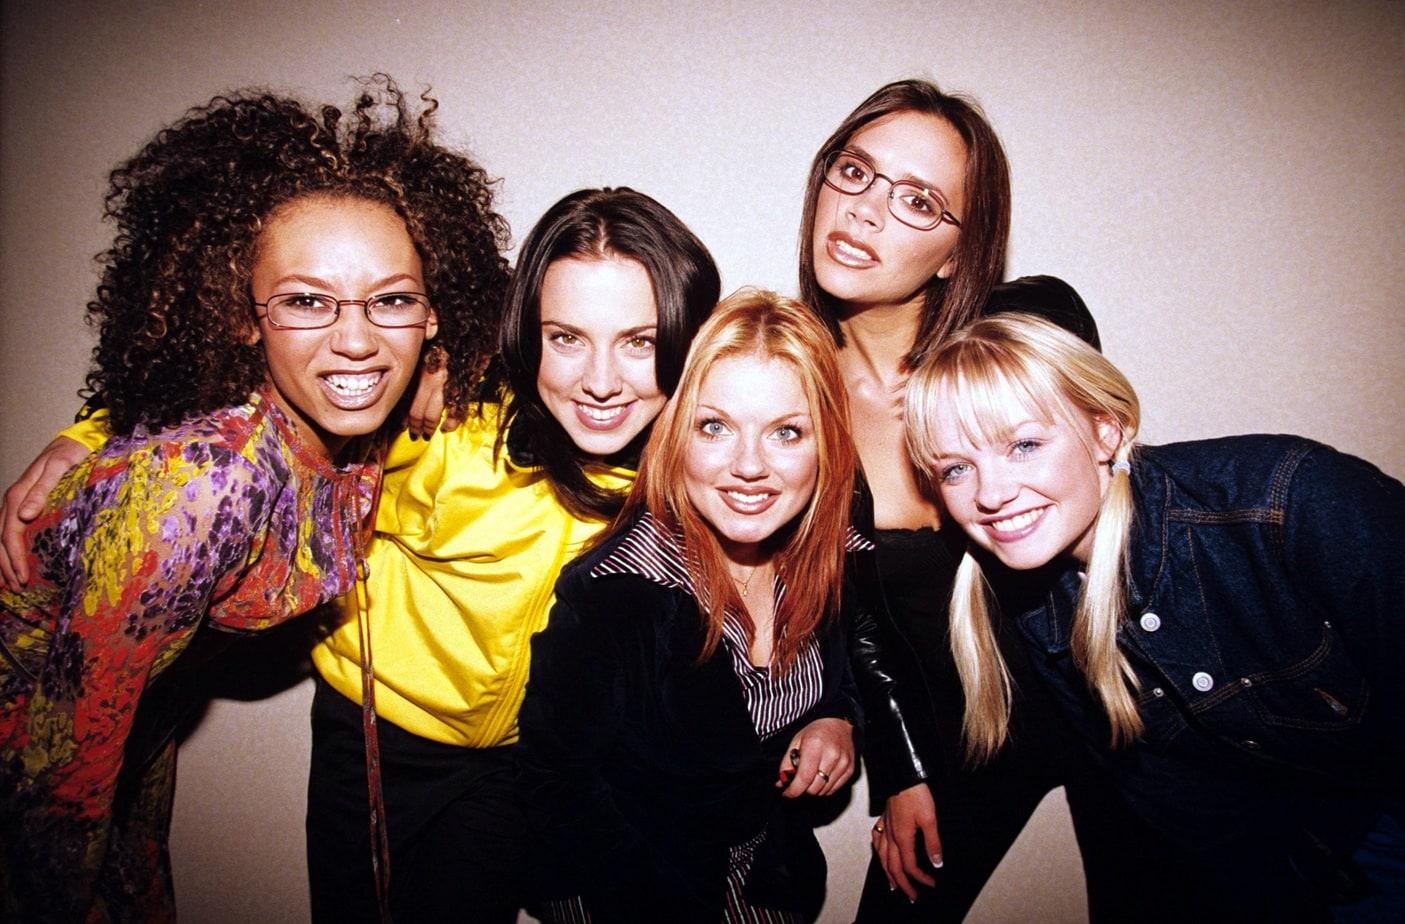 The Spice Girls – Melanie B, Melanie C, Geri Halliwell, Victoria Adams And Emma Bunton